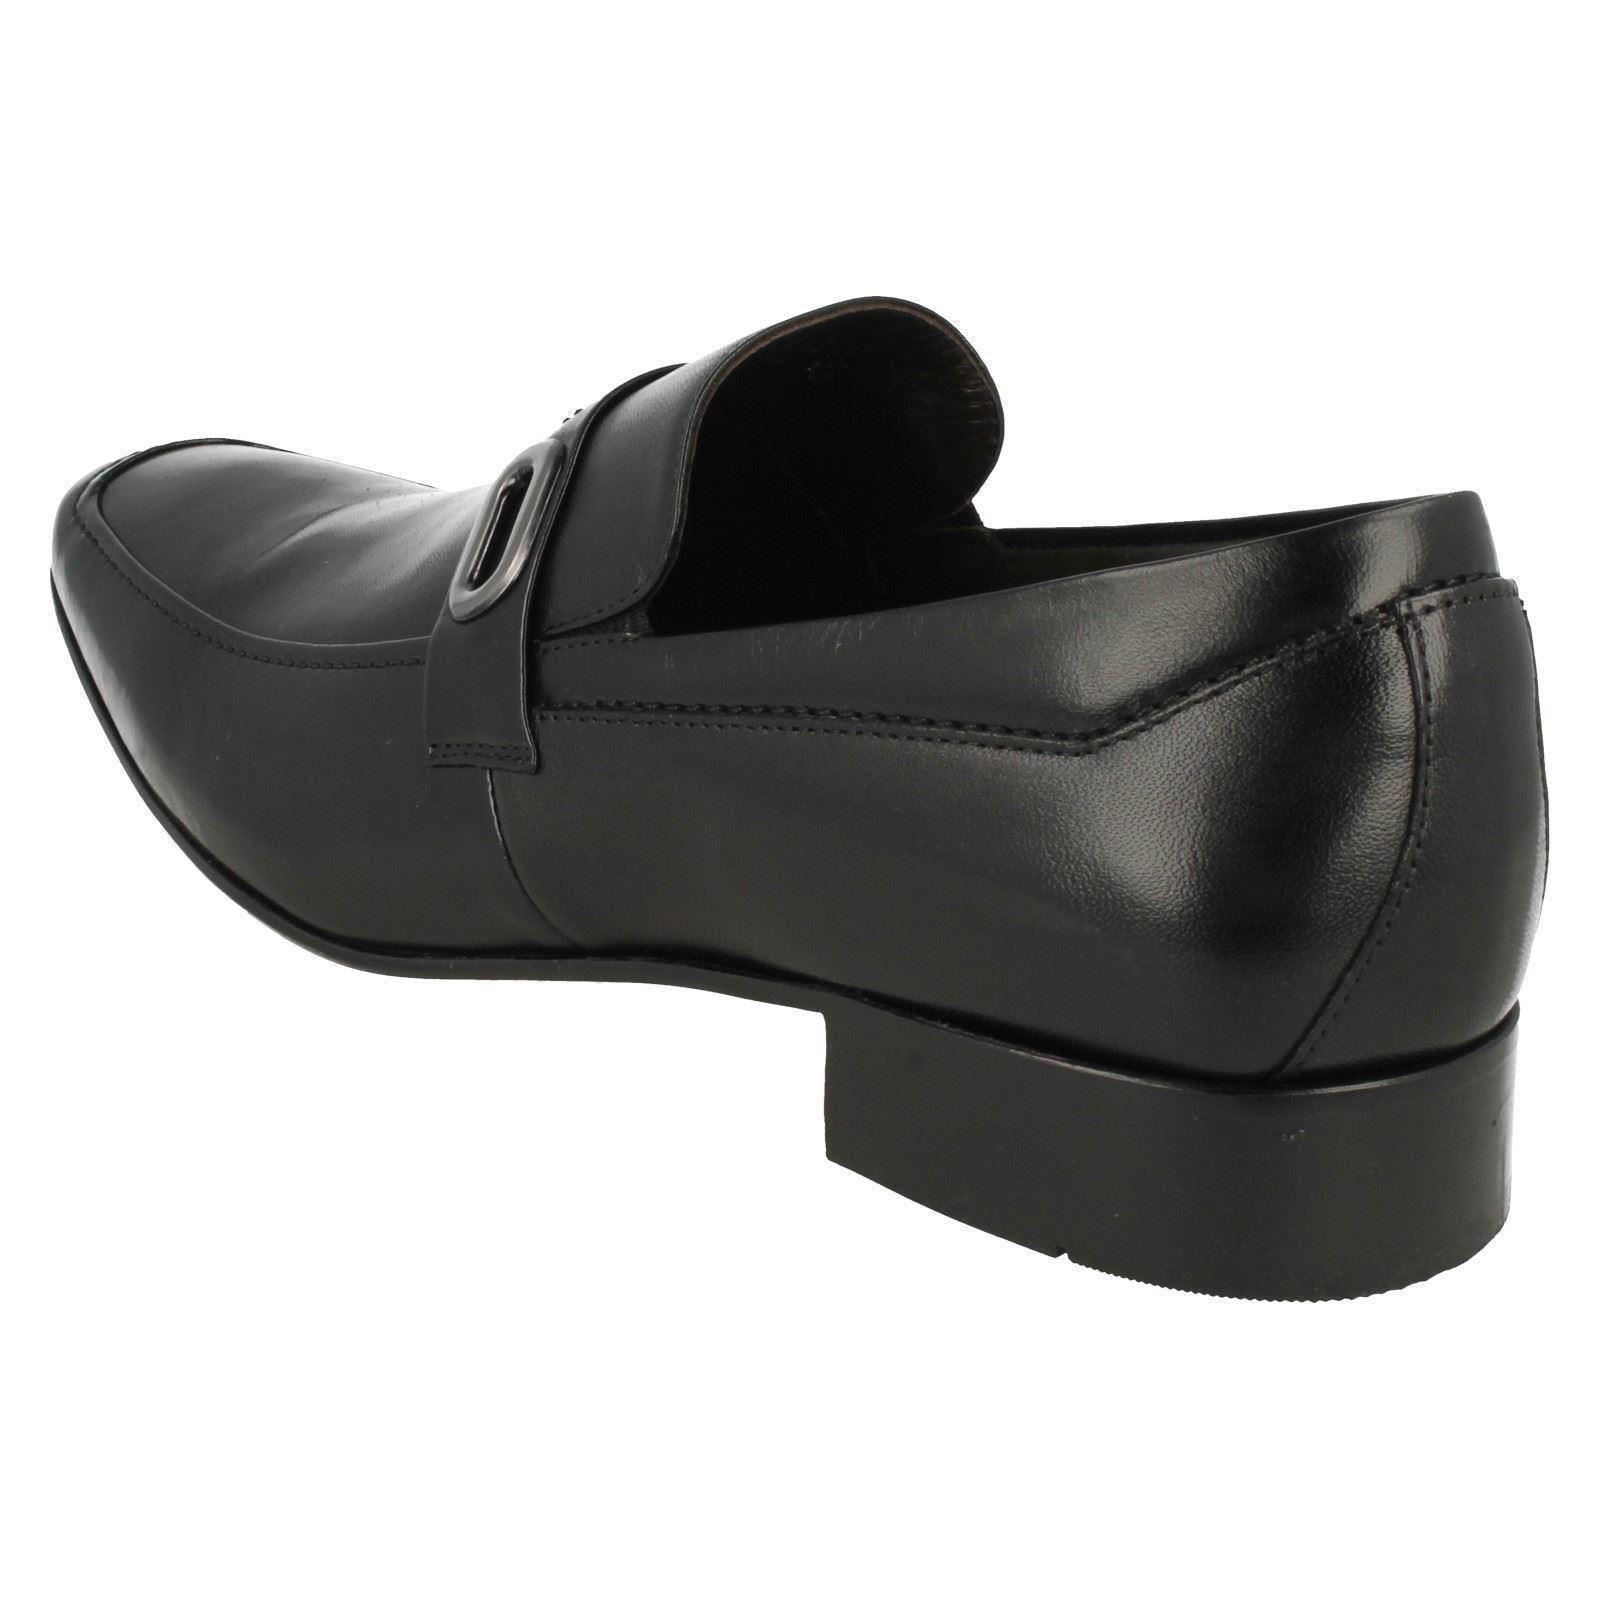 Herren Anatomic Sergipe 2 Smart Smart 2 Slip On Schuhes bdac72